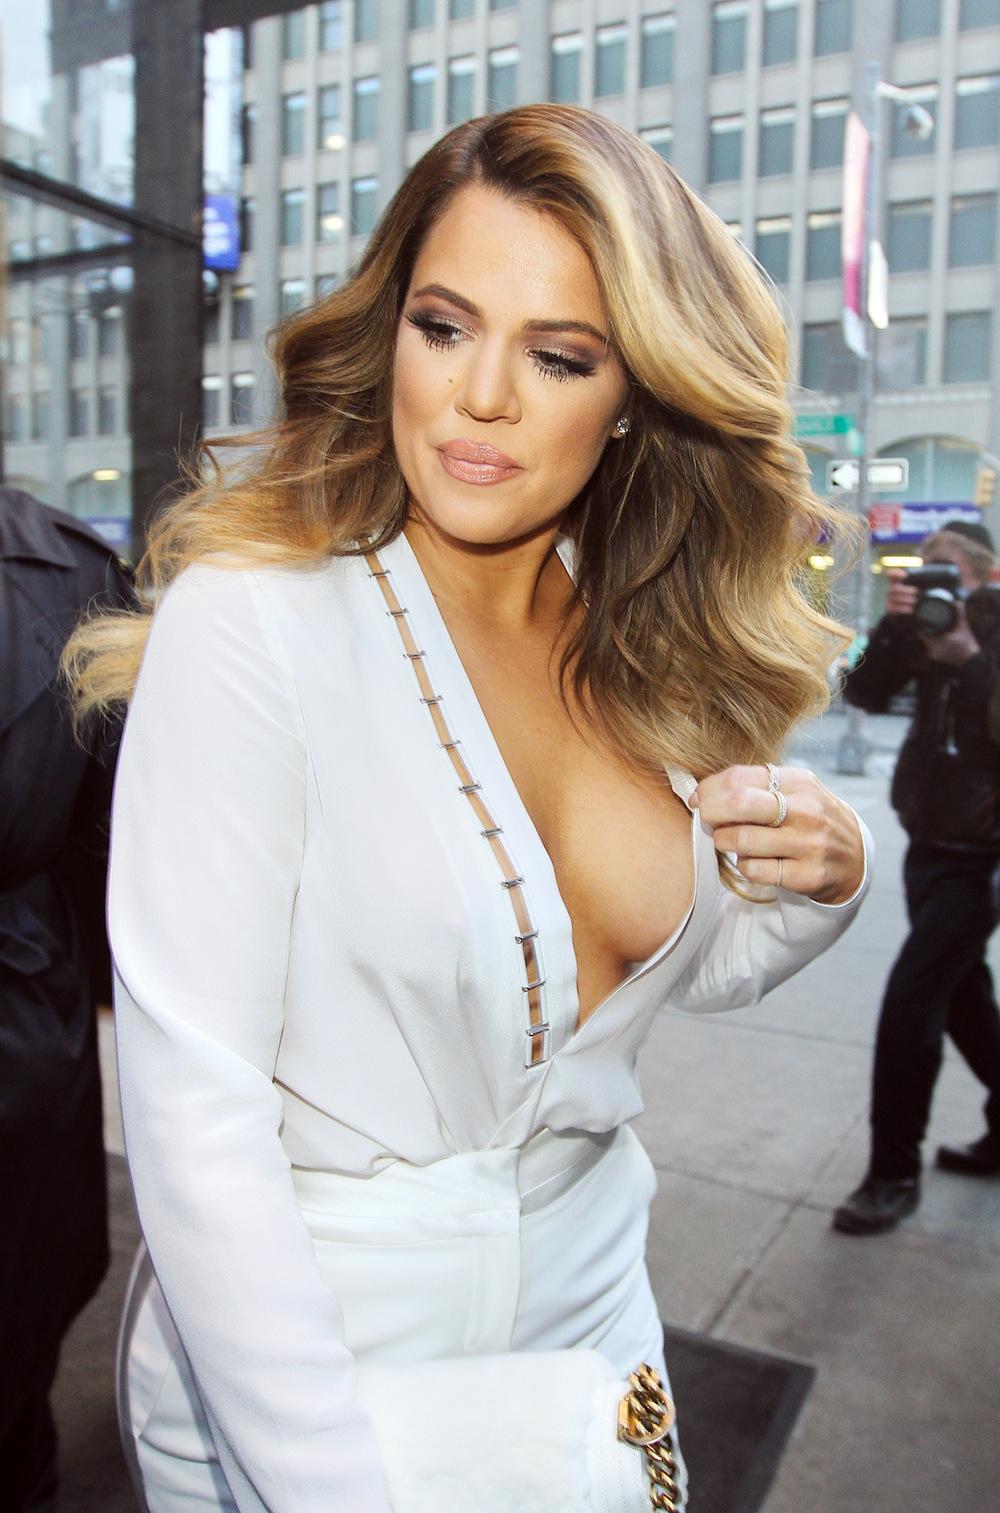 Boobs Khloe Kardashian nude photos 2019